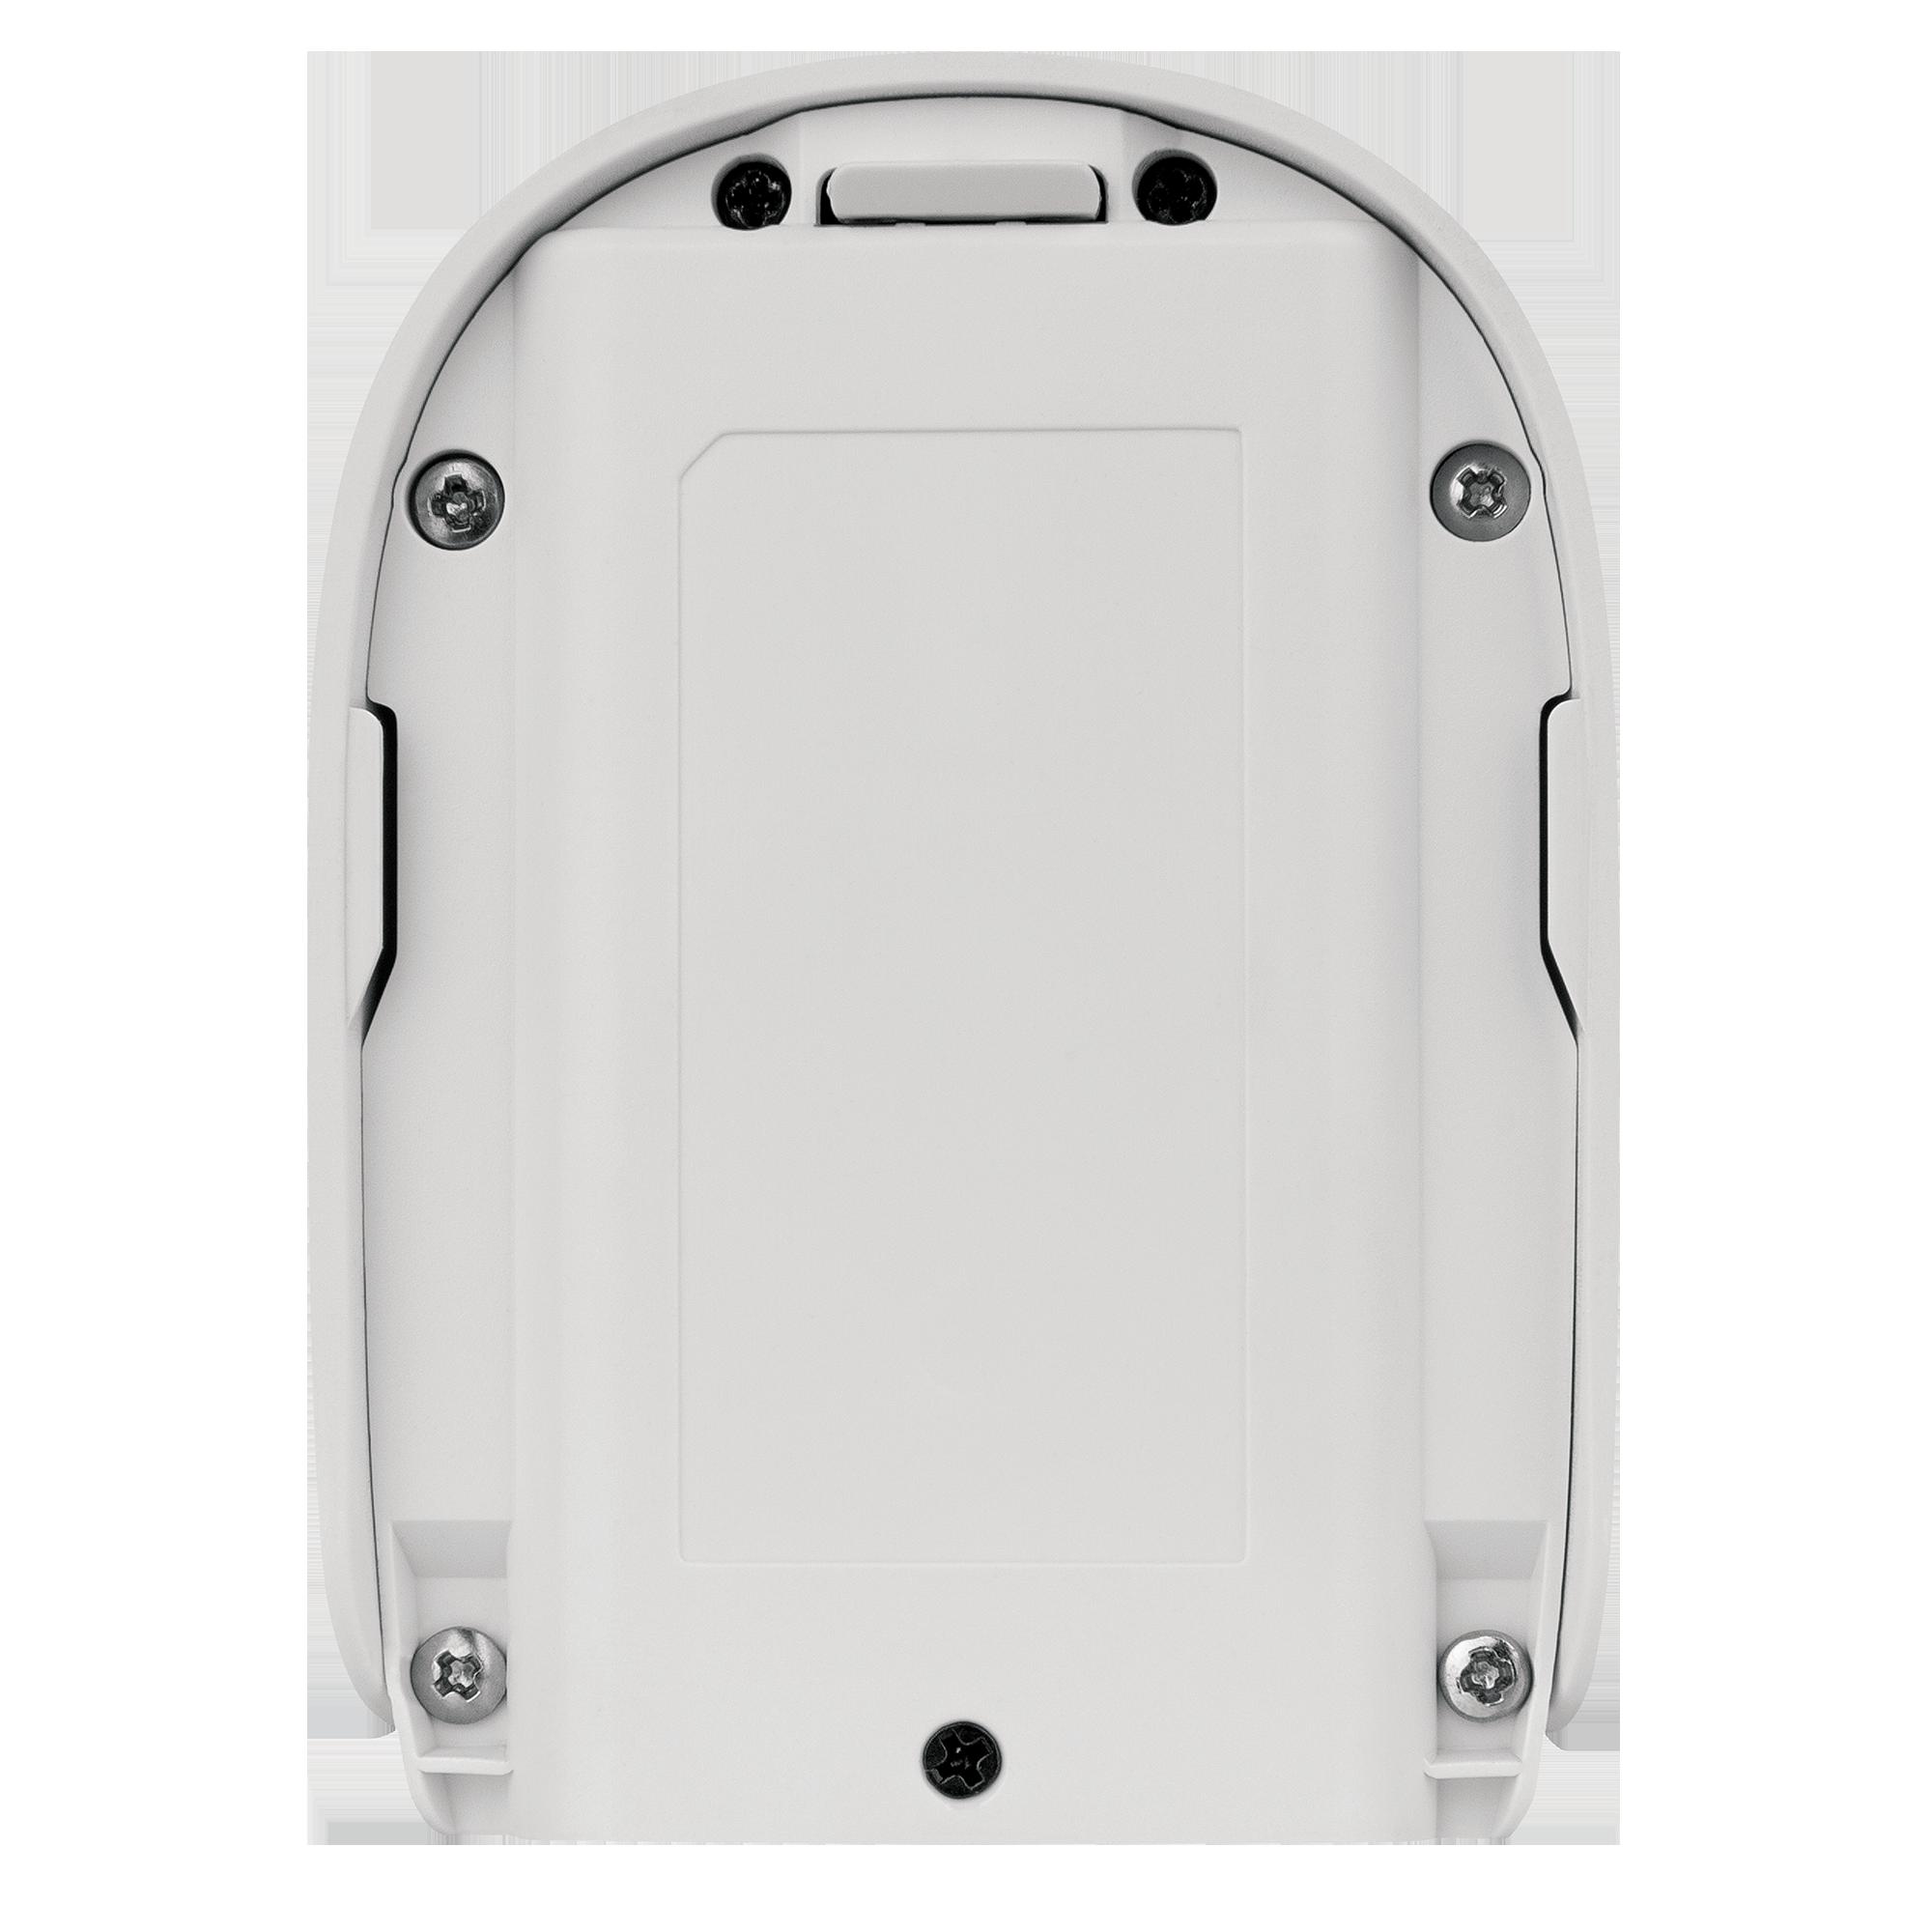 hd portable dvr 2.5 dashboard cam manual